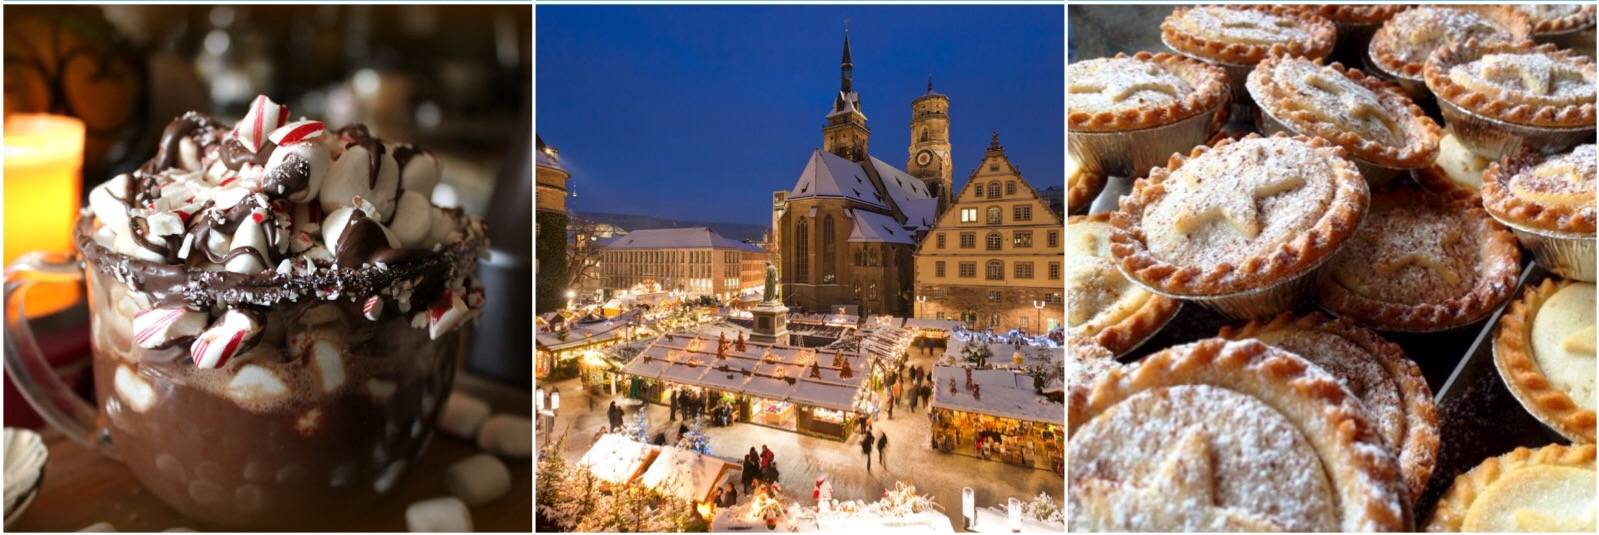 Leukste Duitse kerstmarkten4